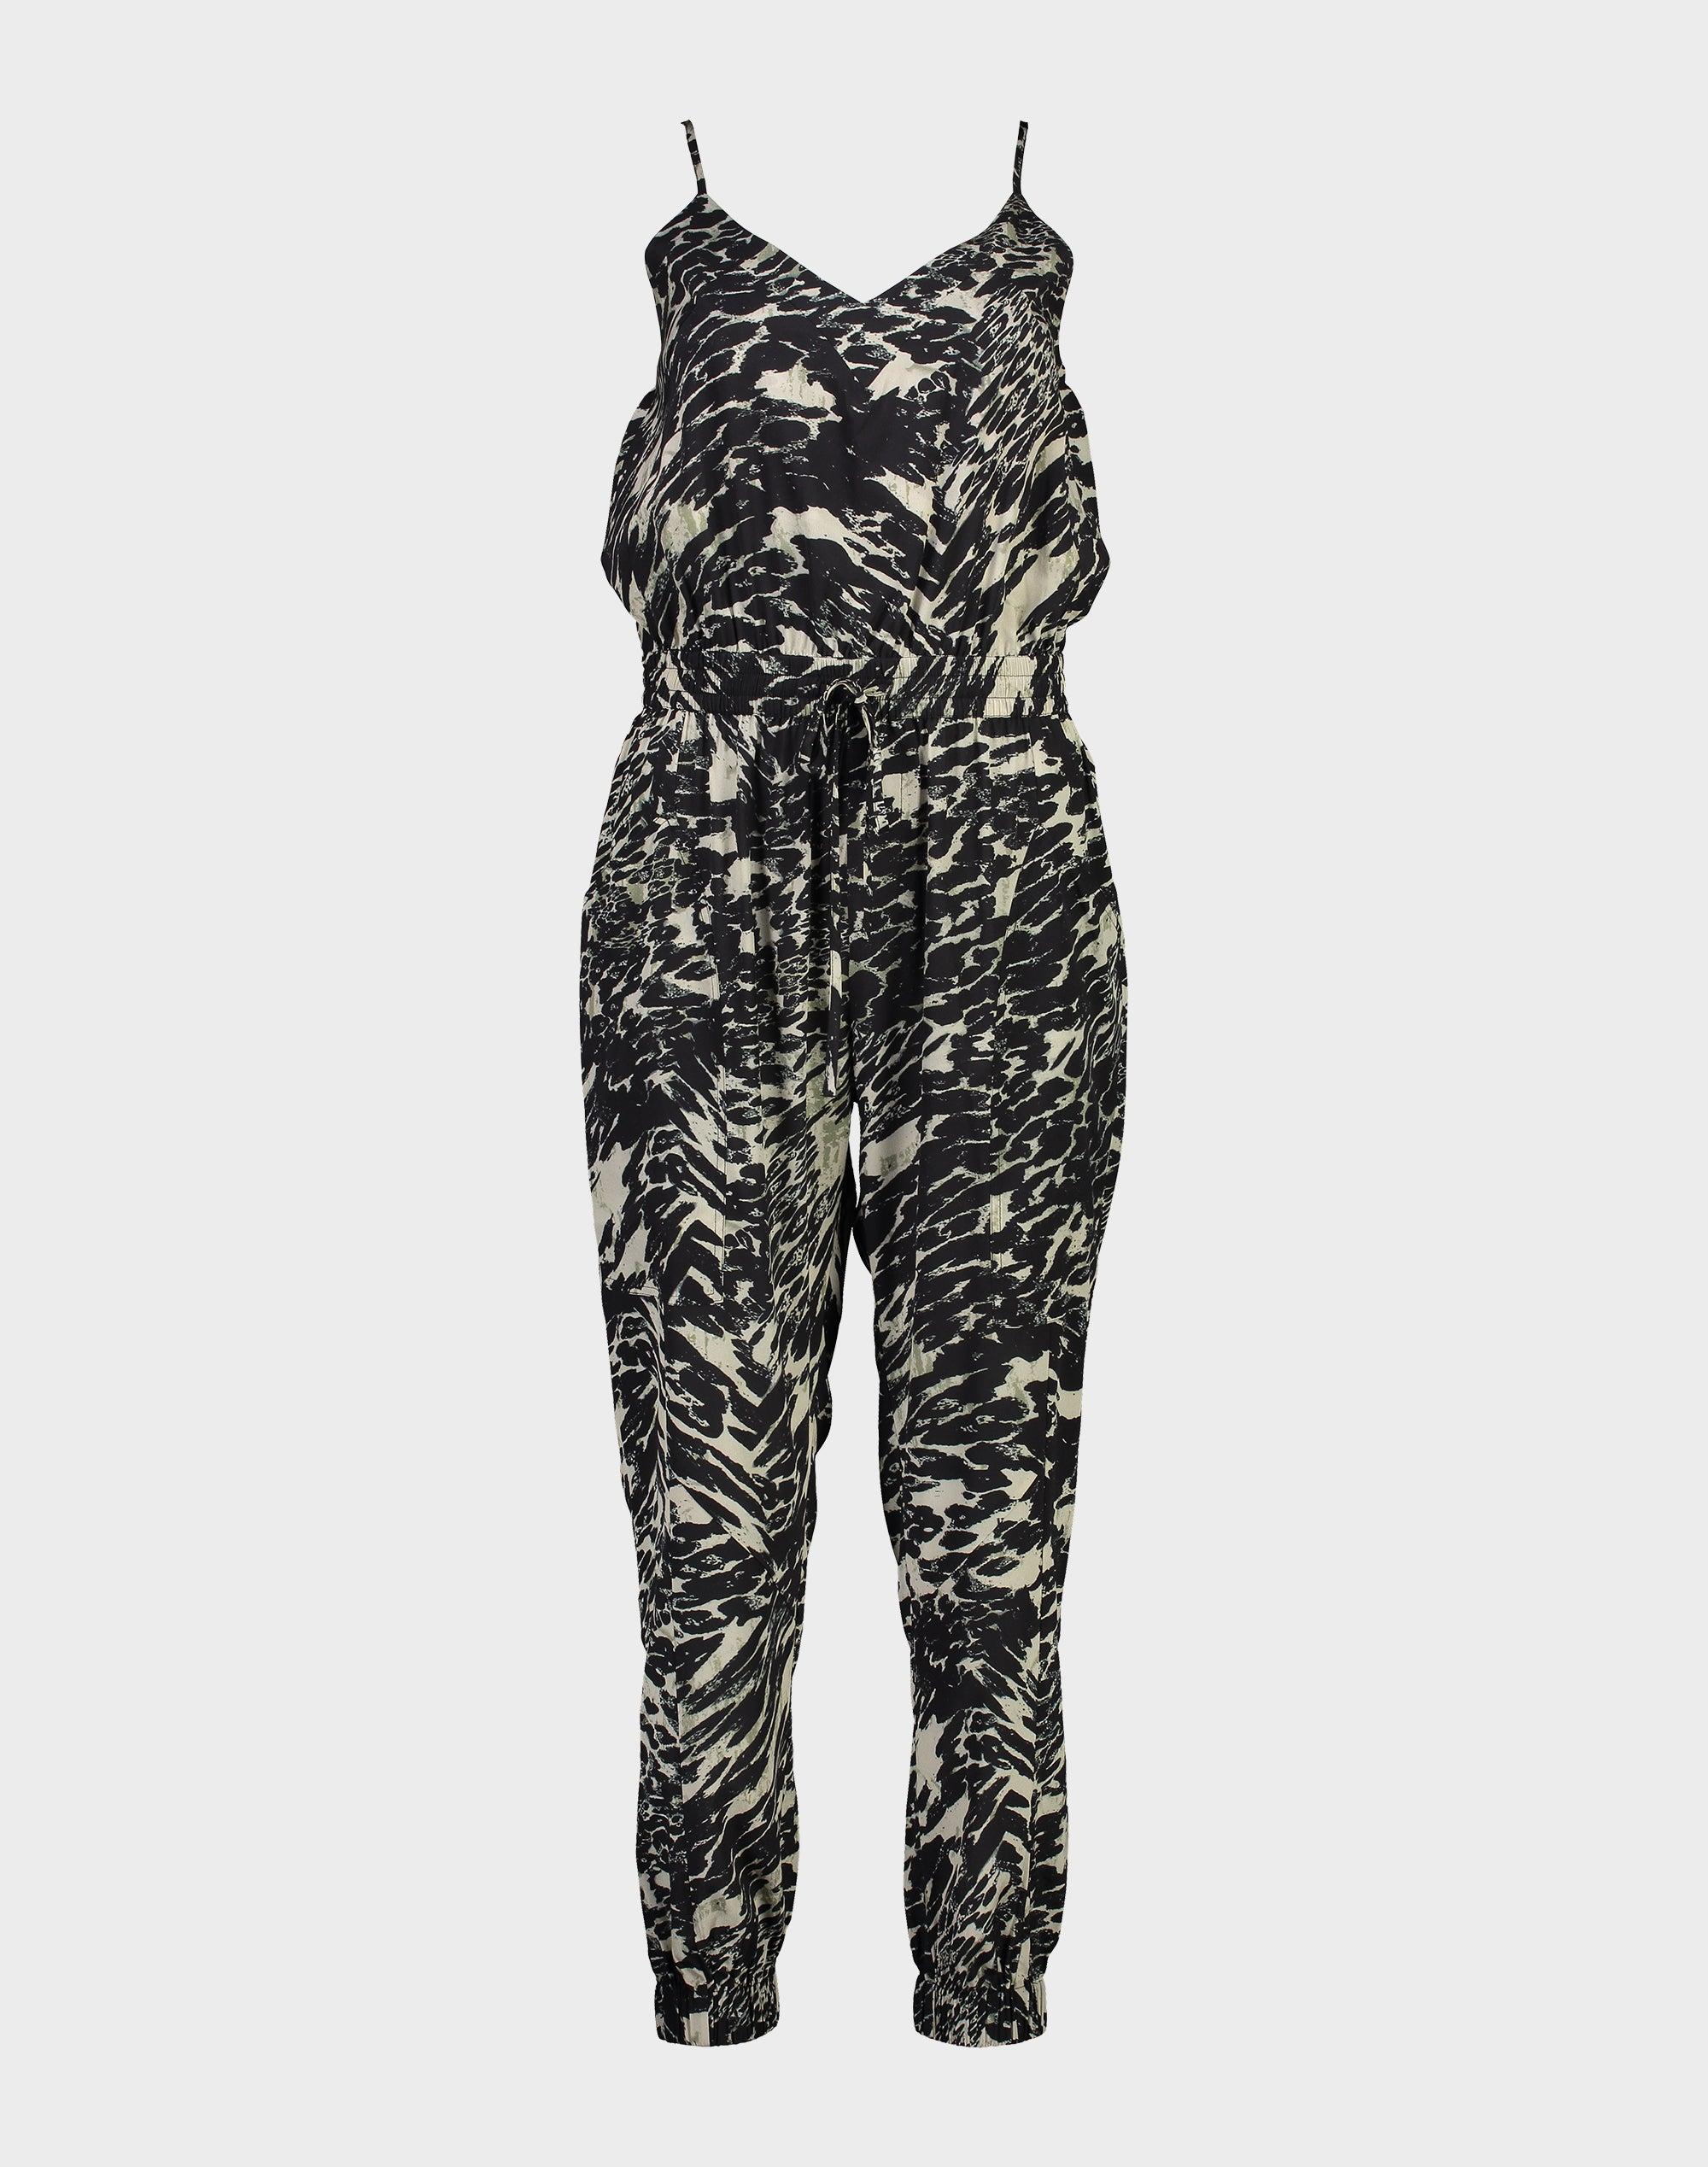 Mista Silk Cotton Jumpsuit